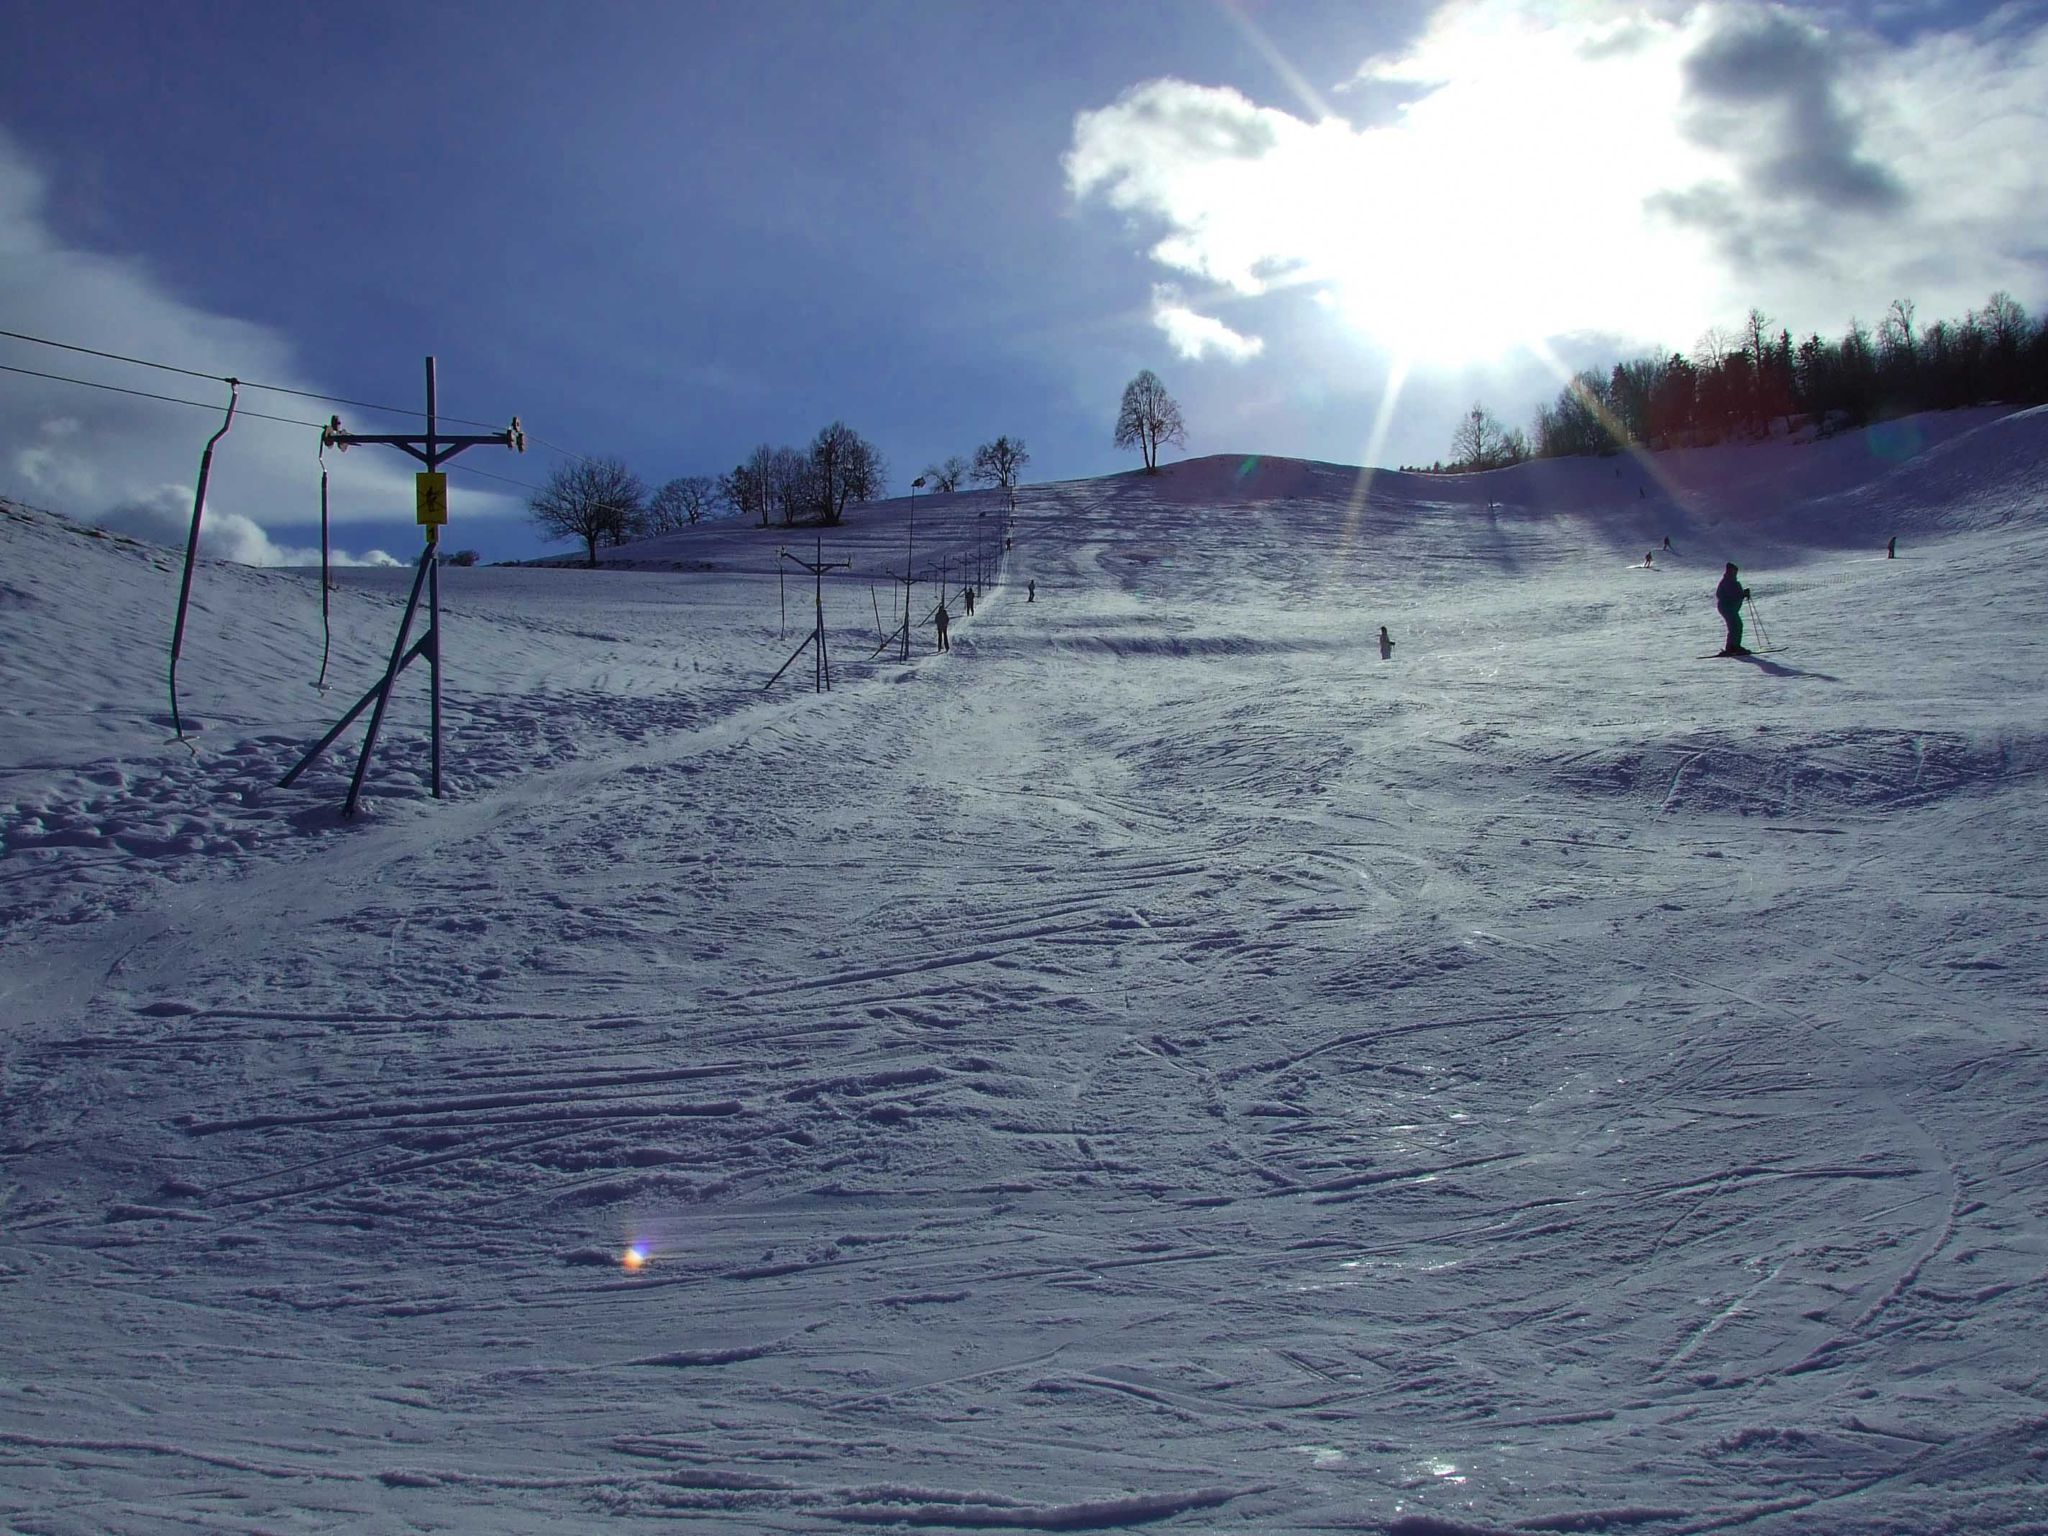 Ski Lift Ilija D 250 Bravy Regi 243 N Bansk 225 Tiavnica